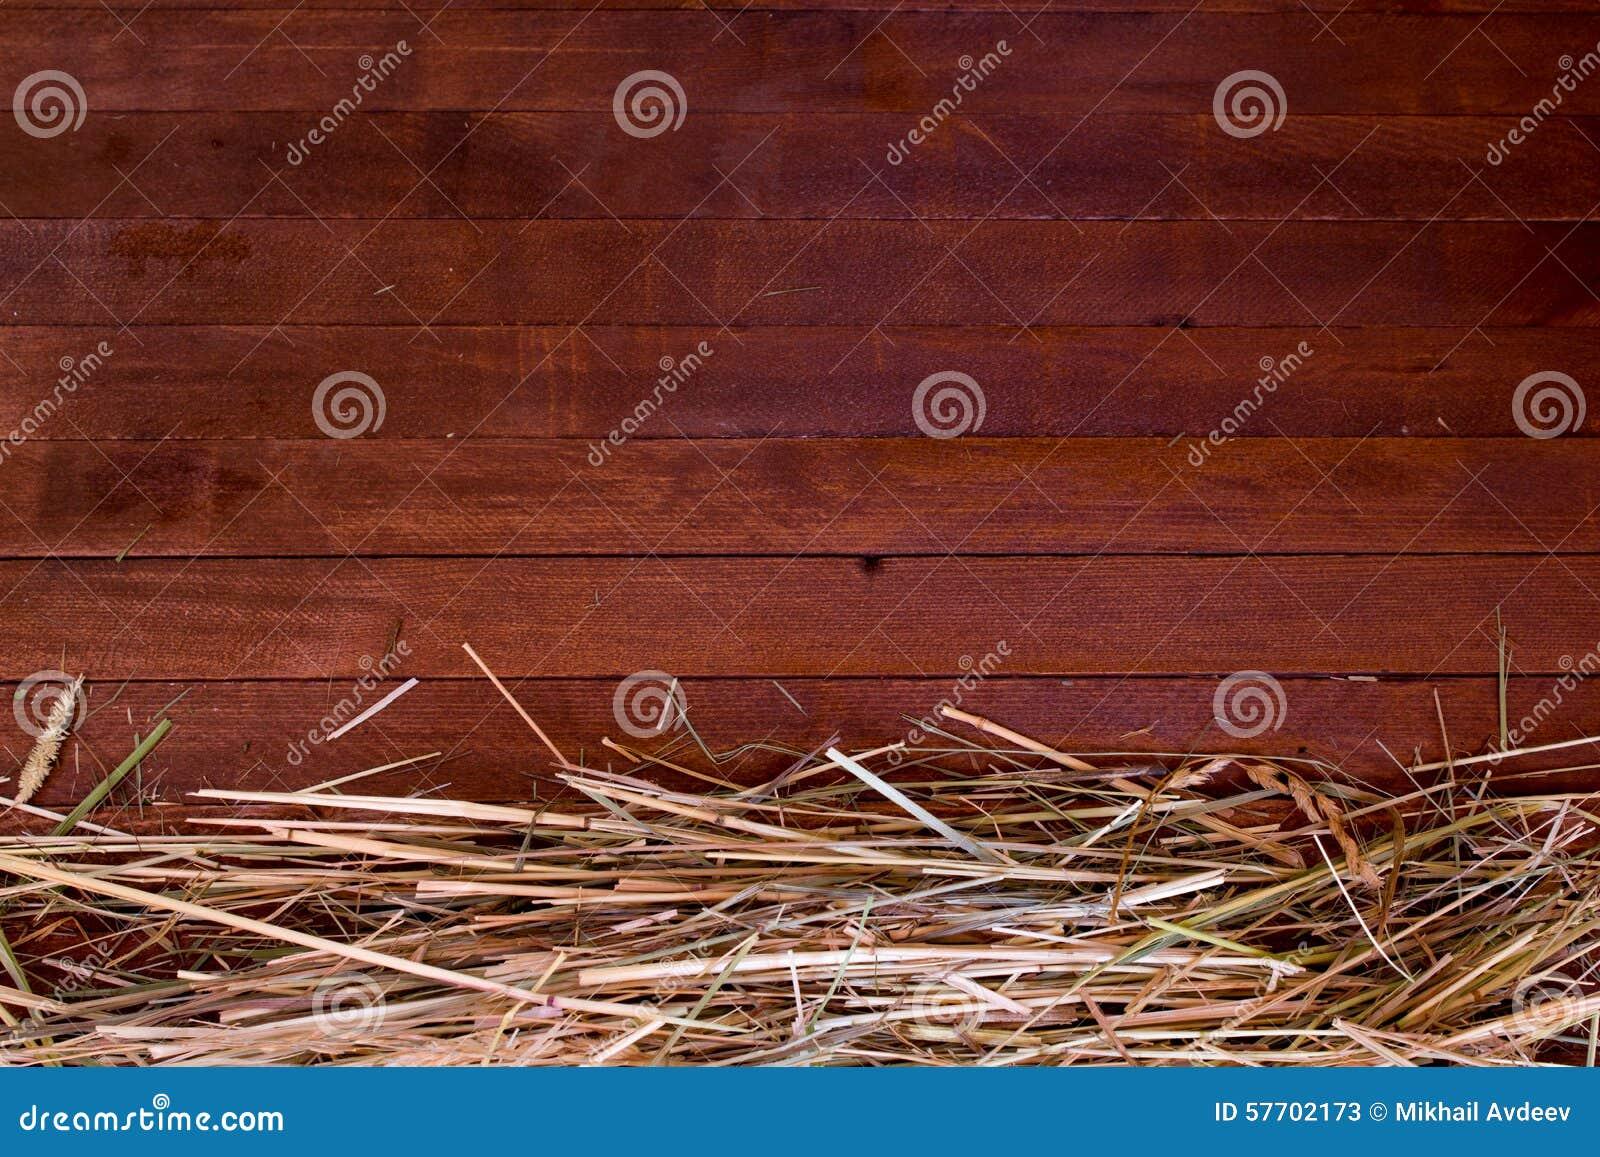 Golden autumn fall hay straw texture background wallpaper